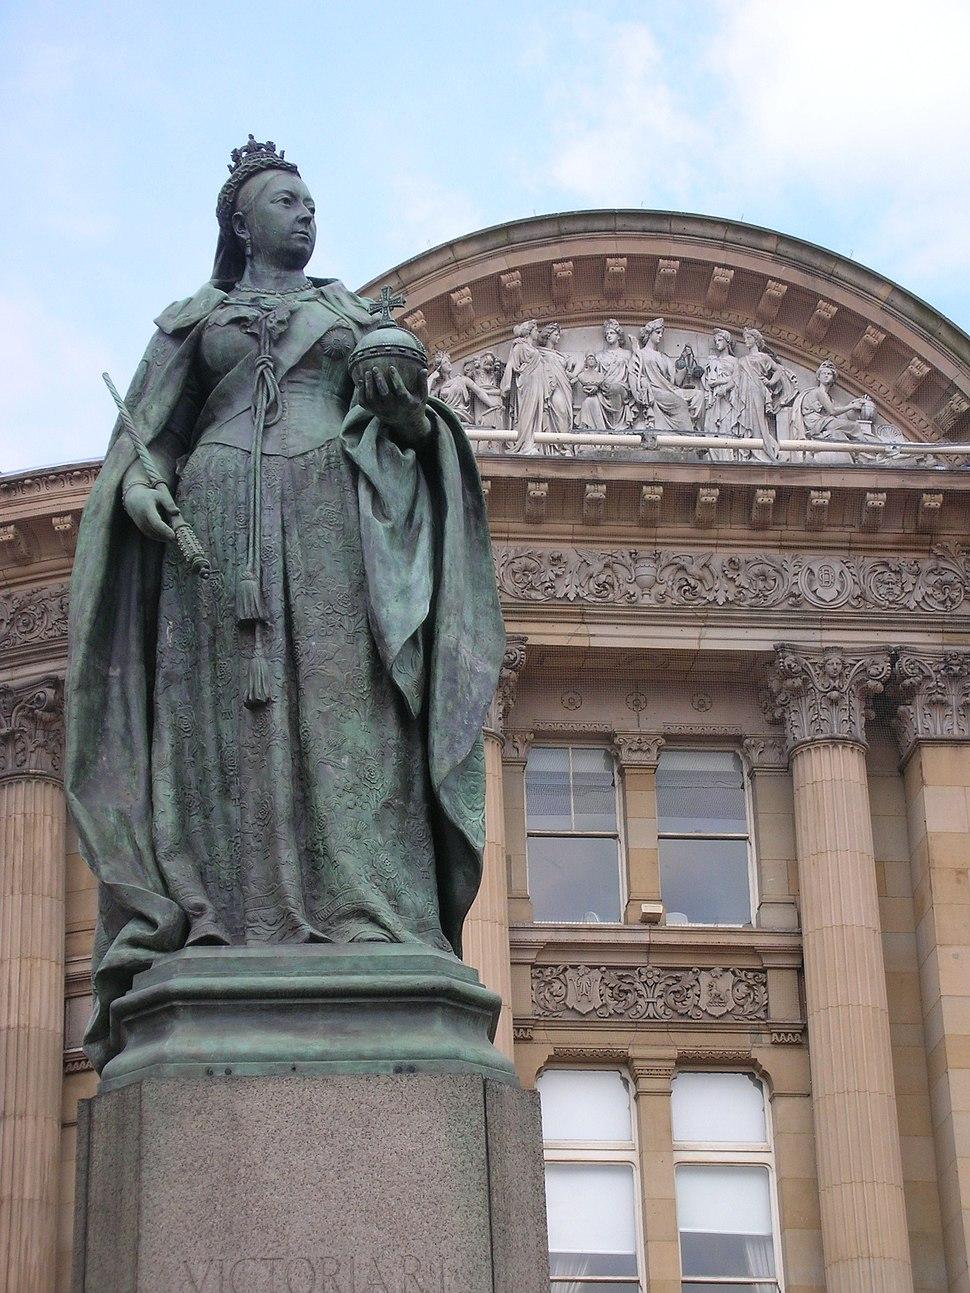 Victoria Statue in Victoria Square Birmingham